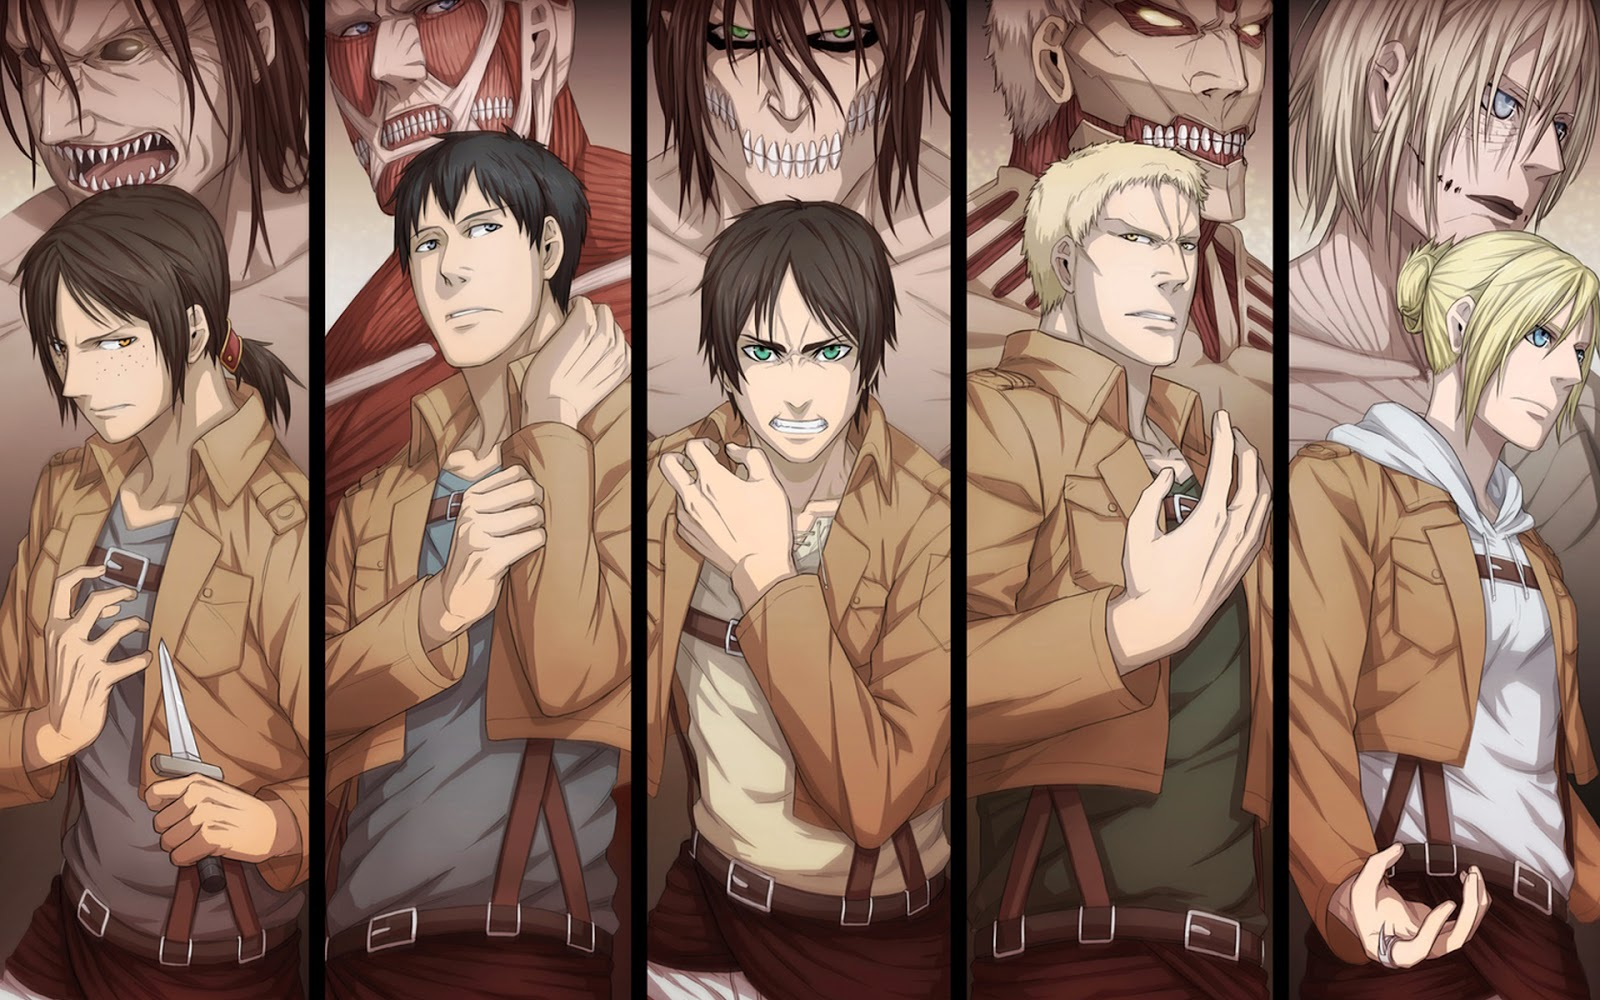 All Kinds of Titan Shingeki no Kyojin hd wallpaper